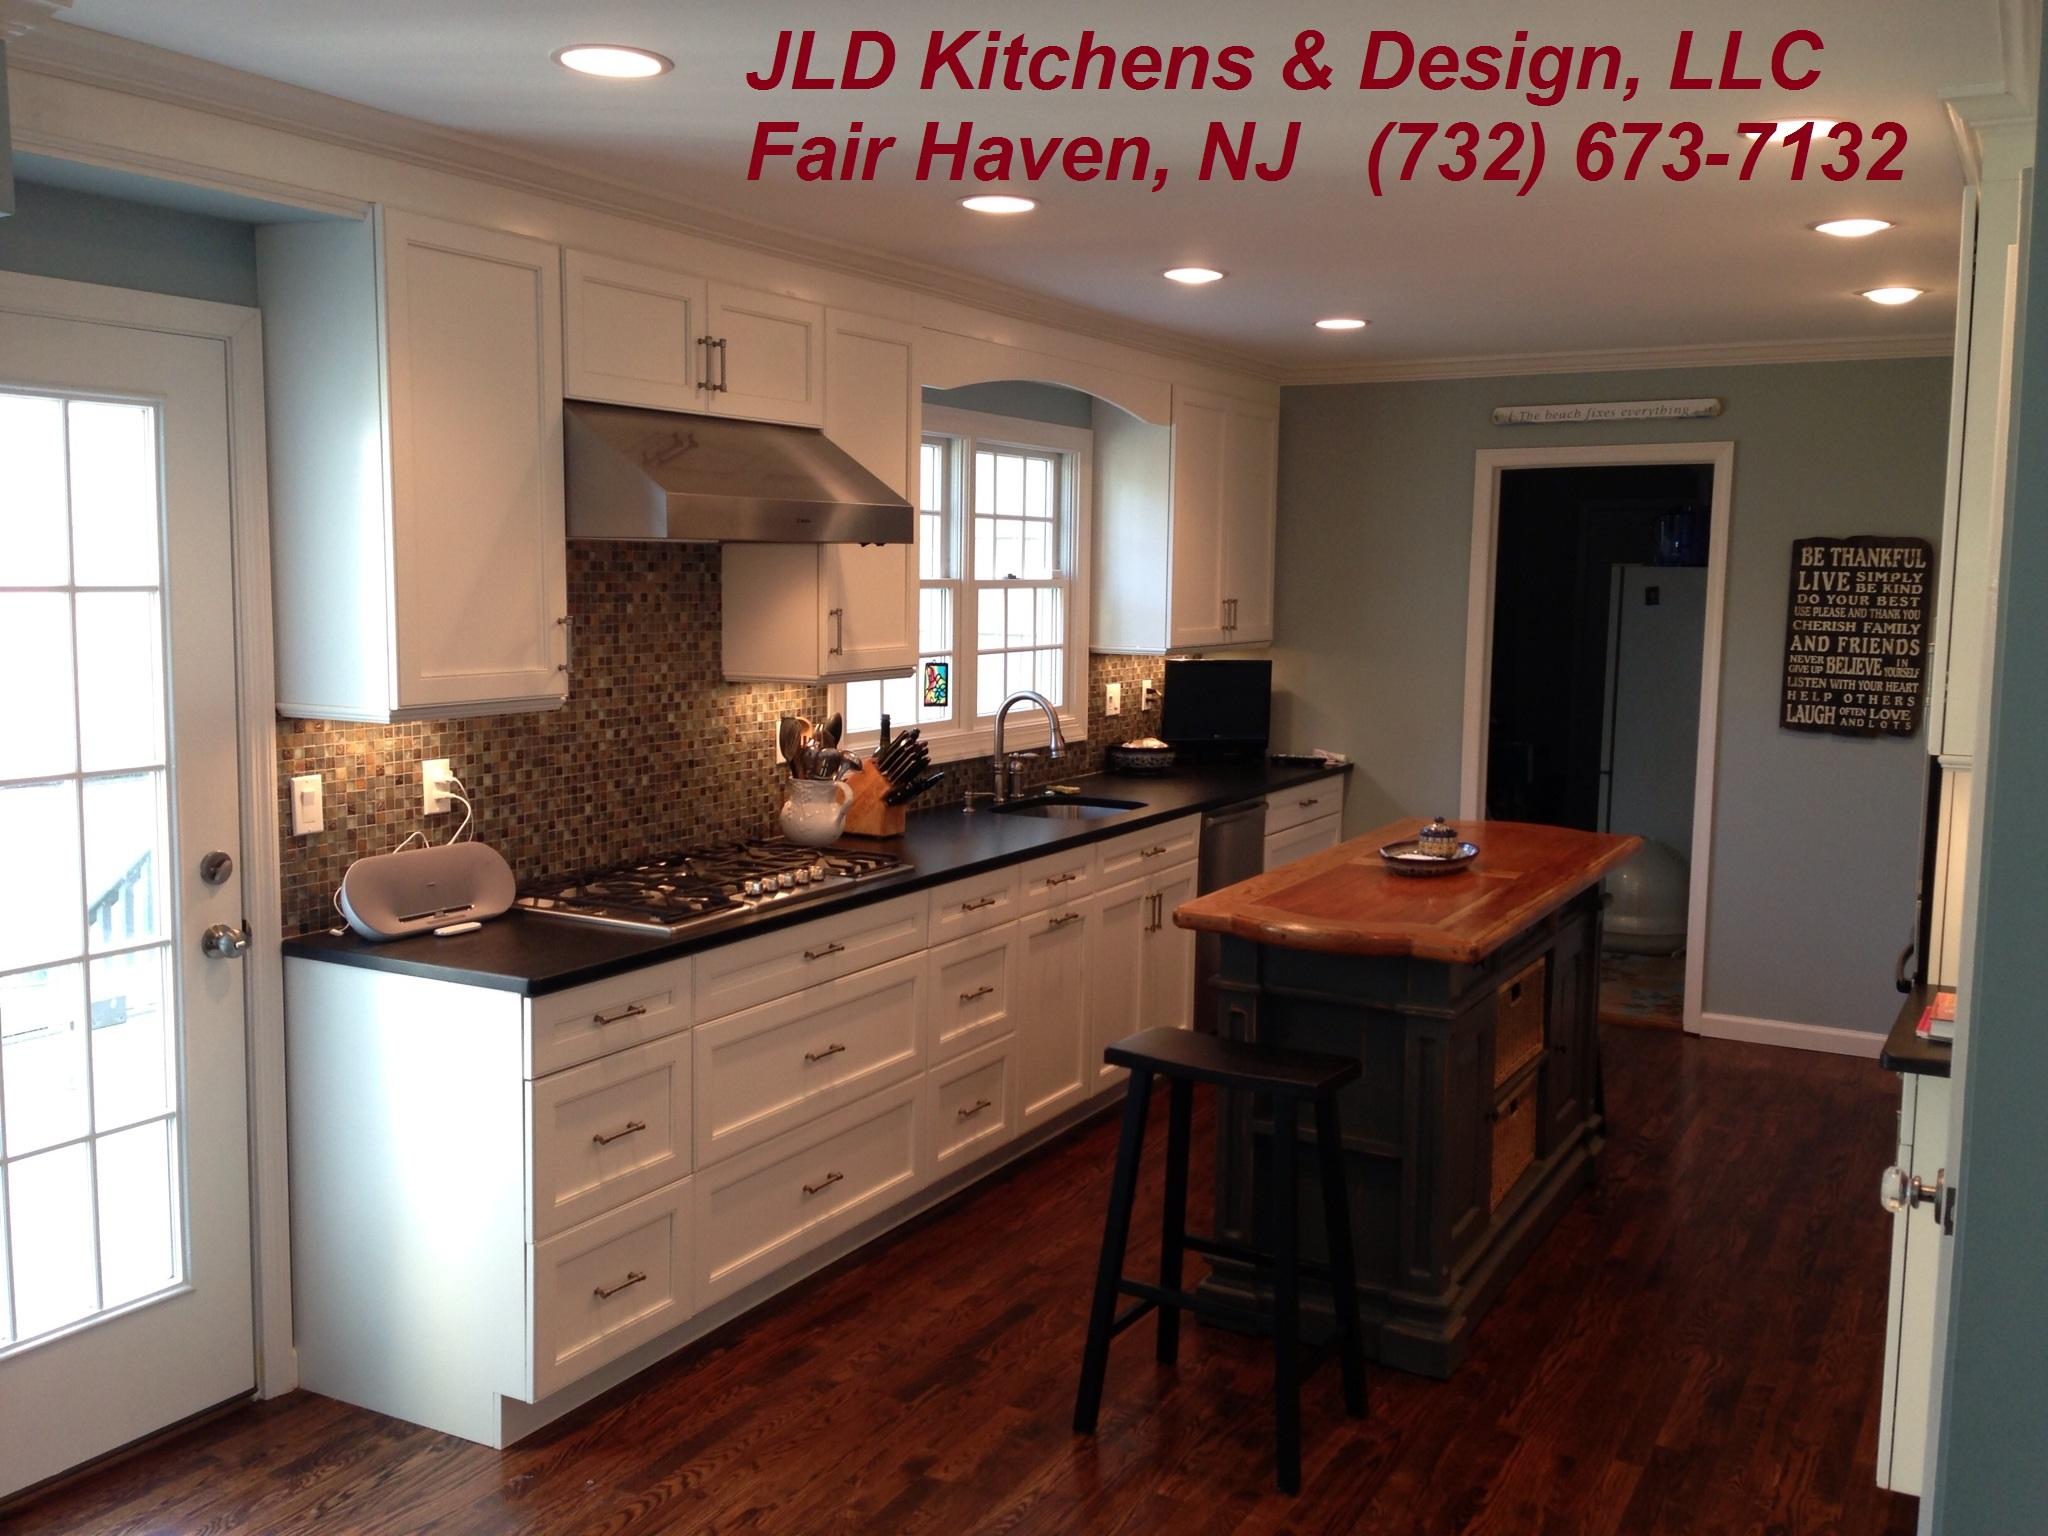 Jld Kitchens And Design Llc Kitchens Fair Haven Nj